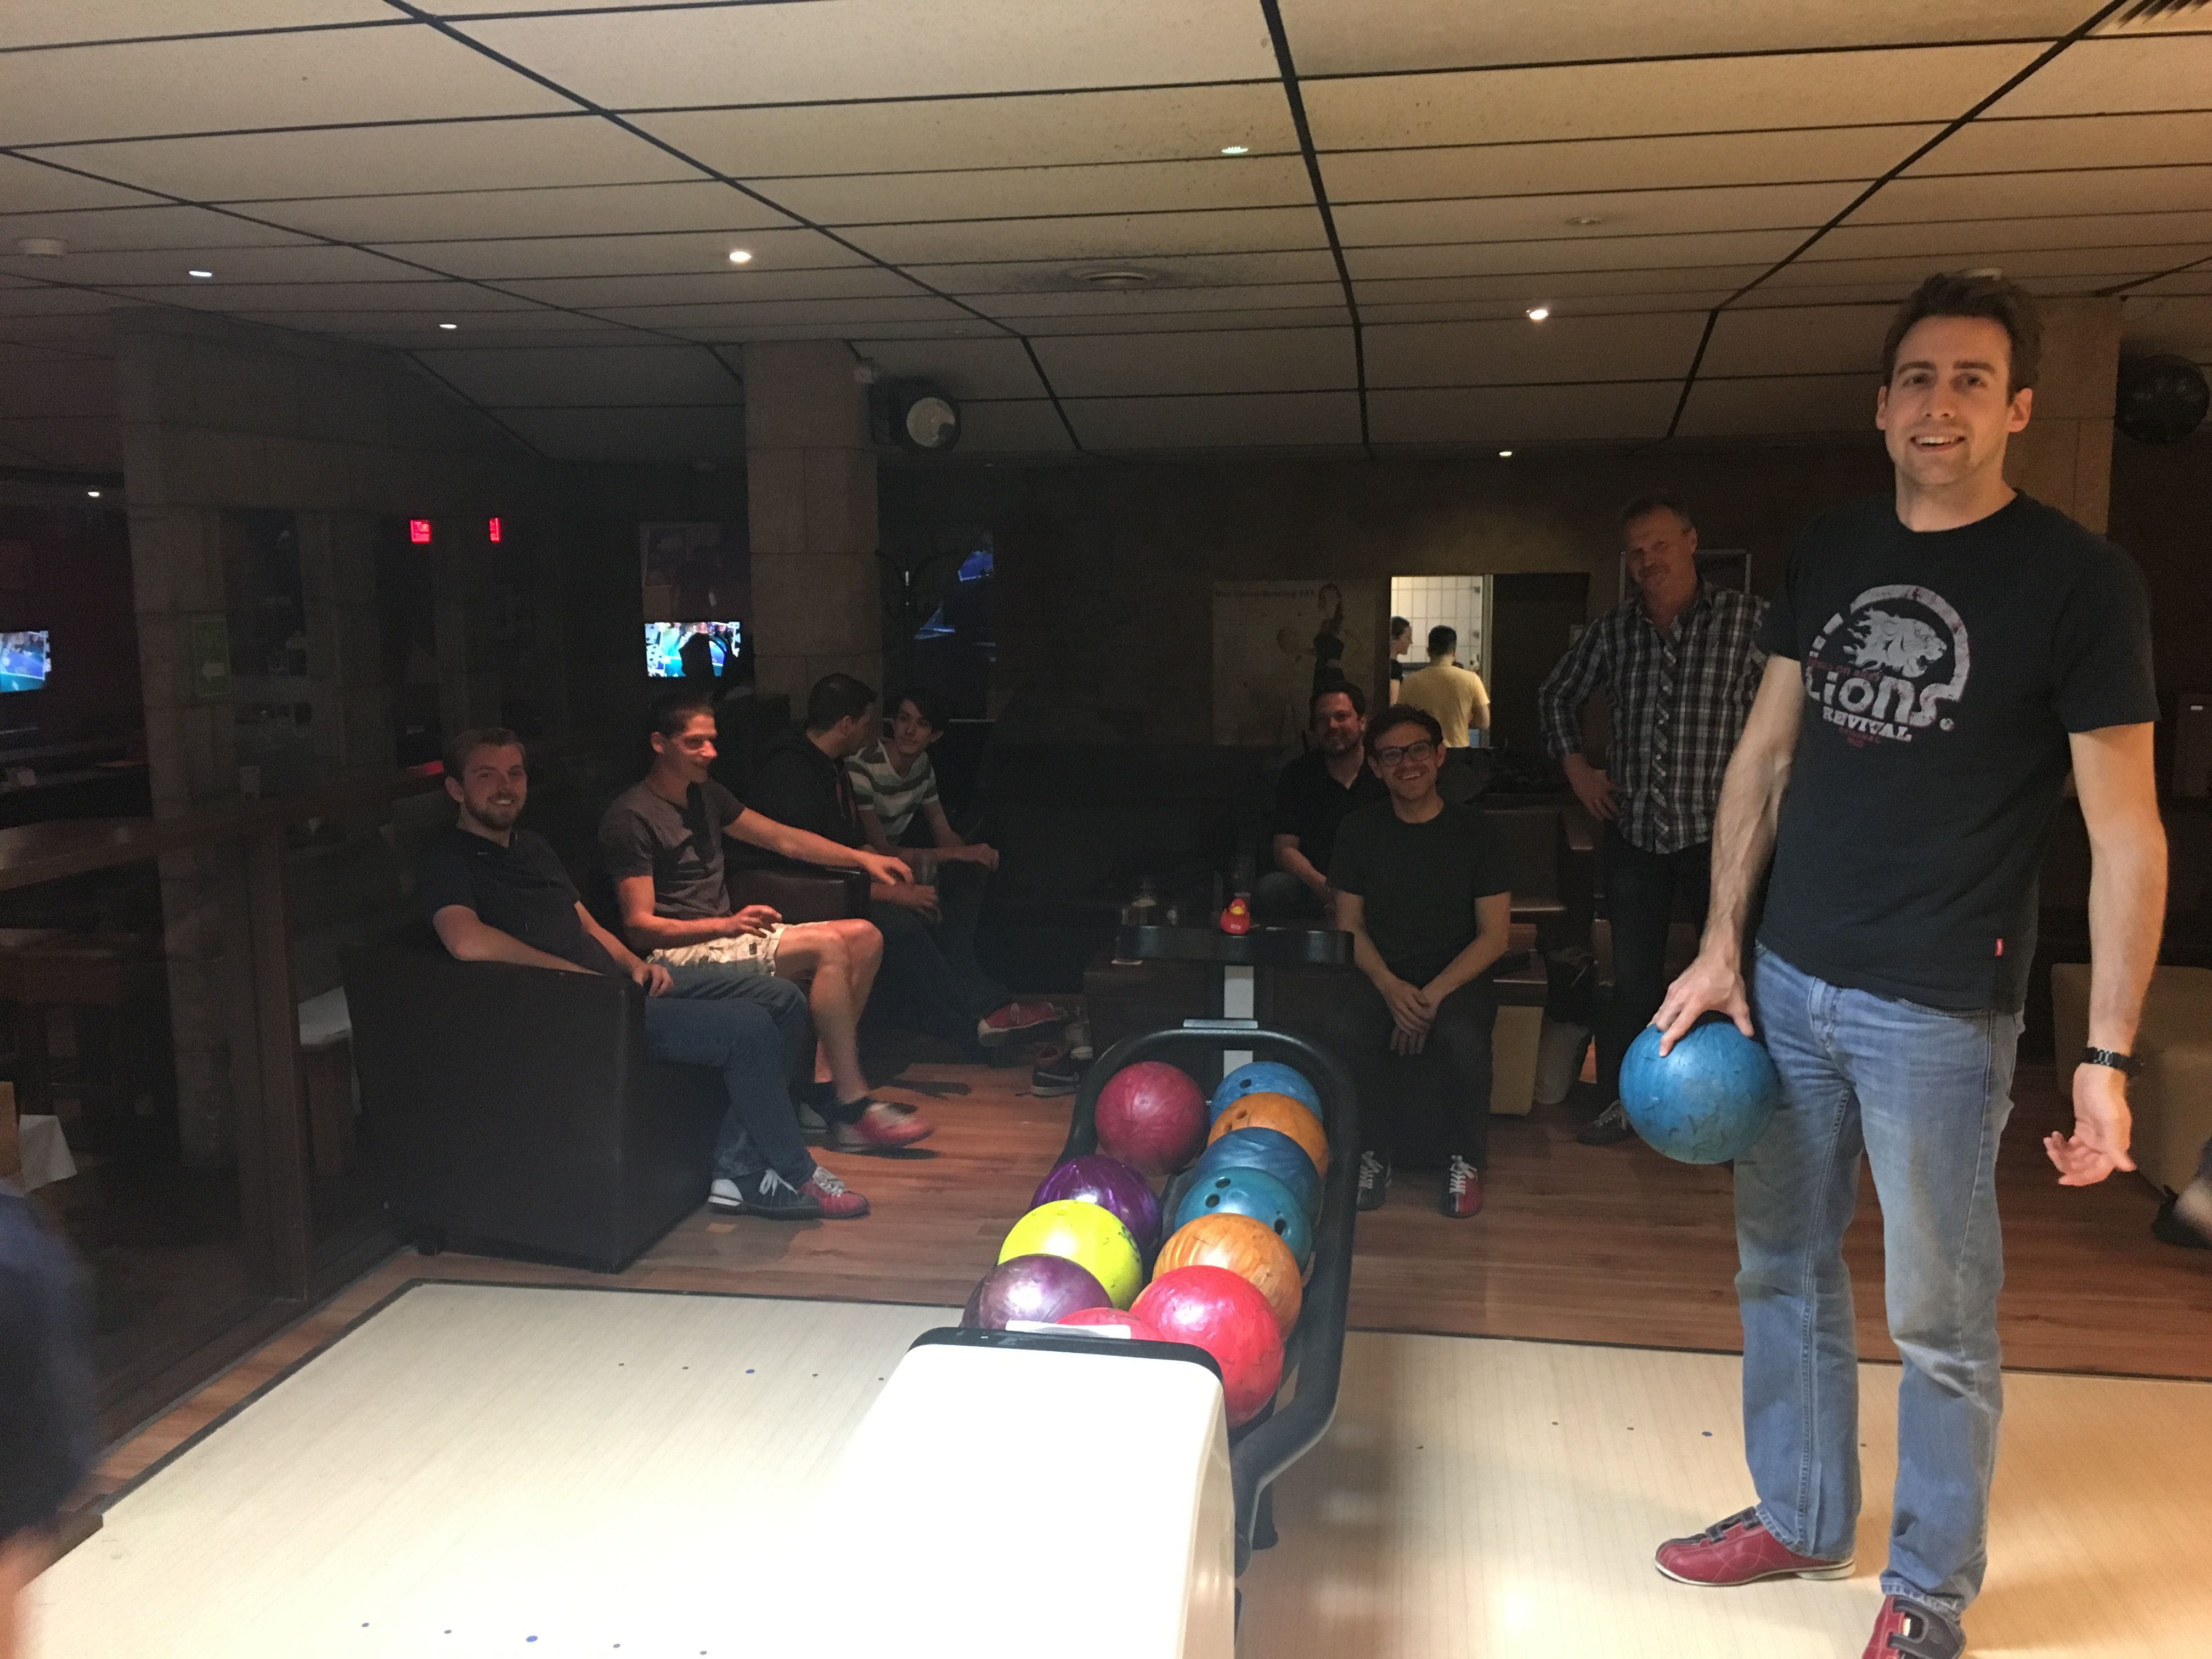 SE geht Bowling